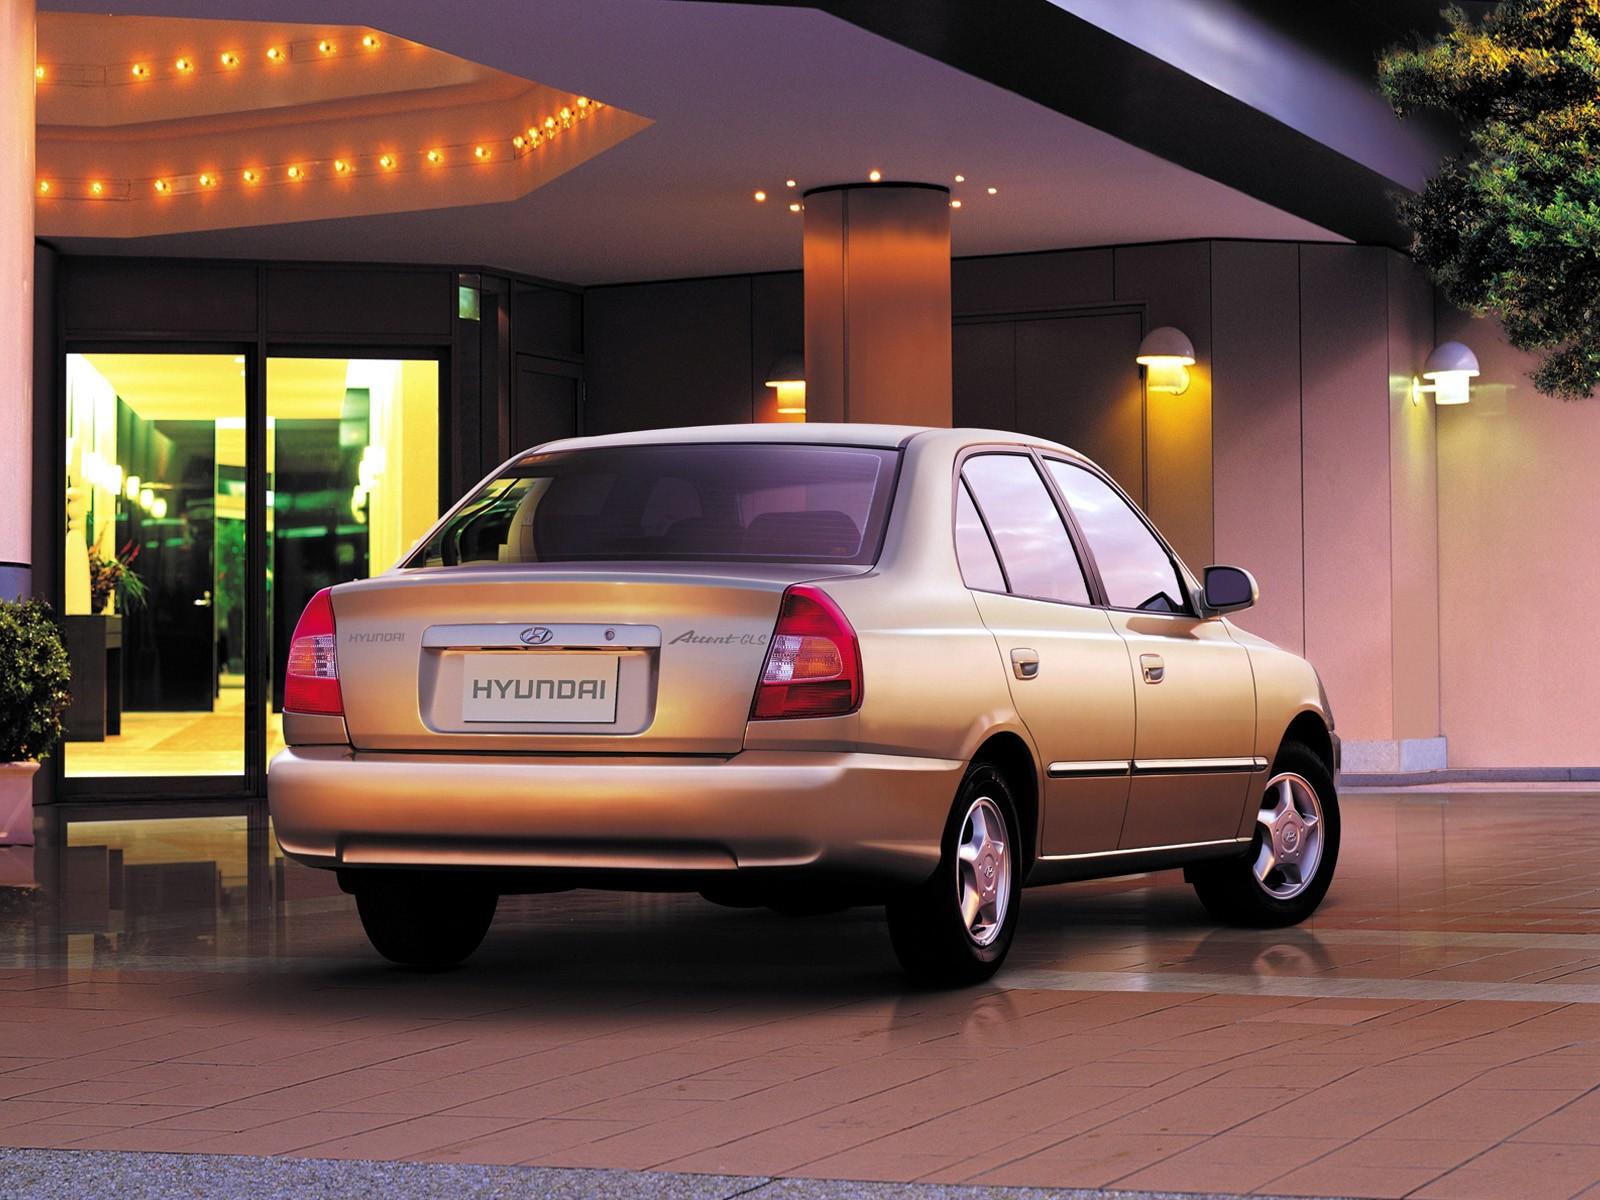 2016 Hyundai Genesis Coupe >> HYUNDAI Accent 4 Doors specs - 1999, 2000, 2001, 2002, 2003 - autoevolution